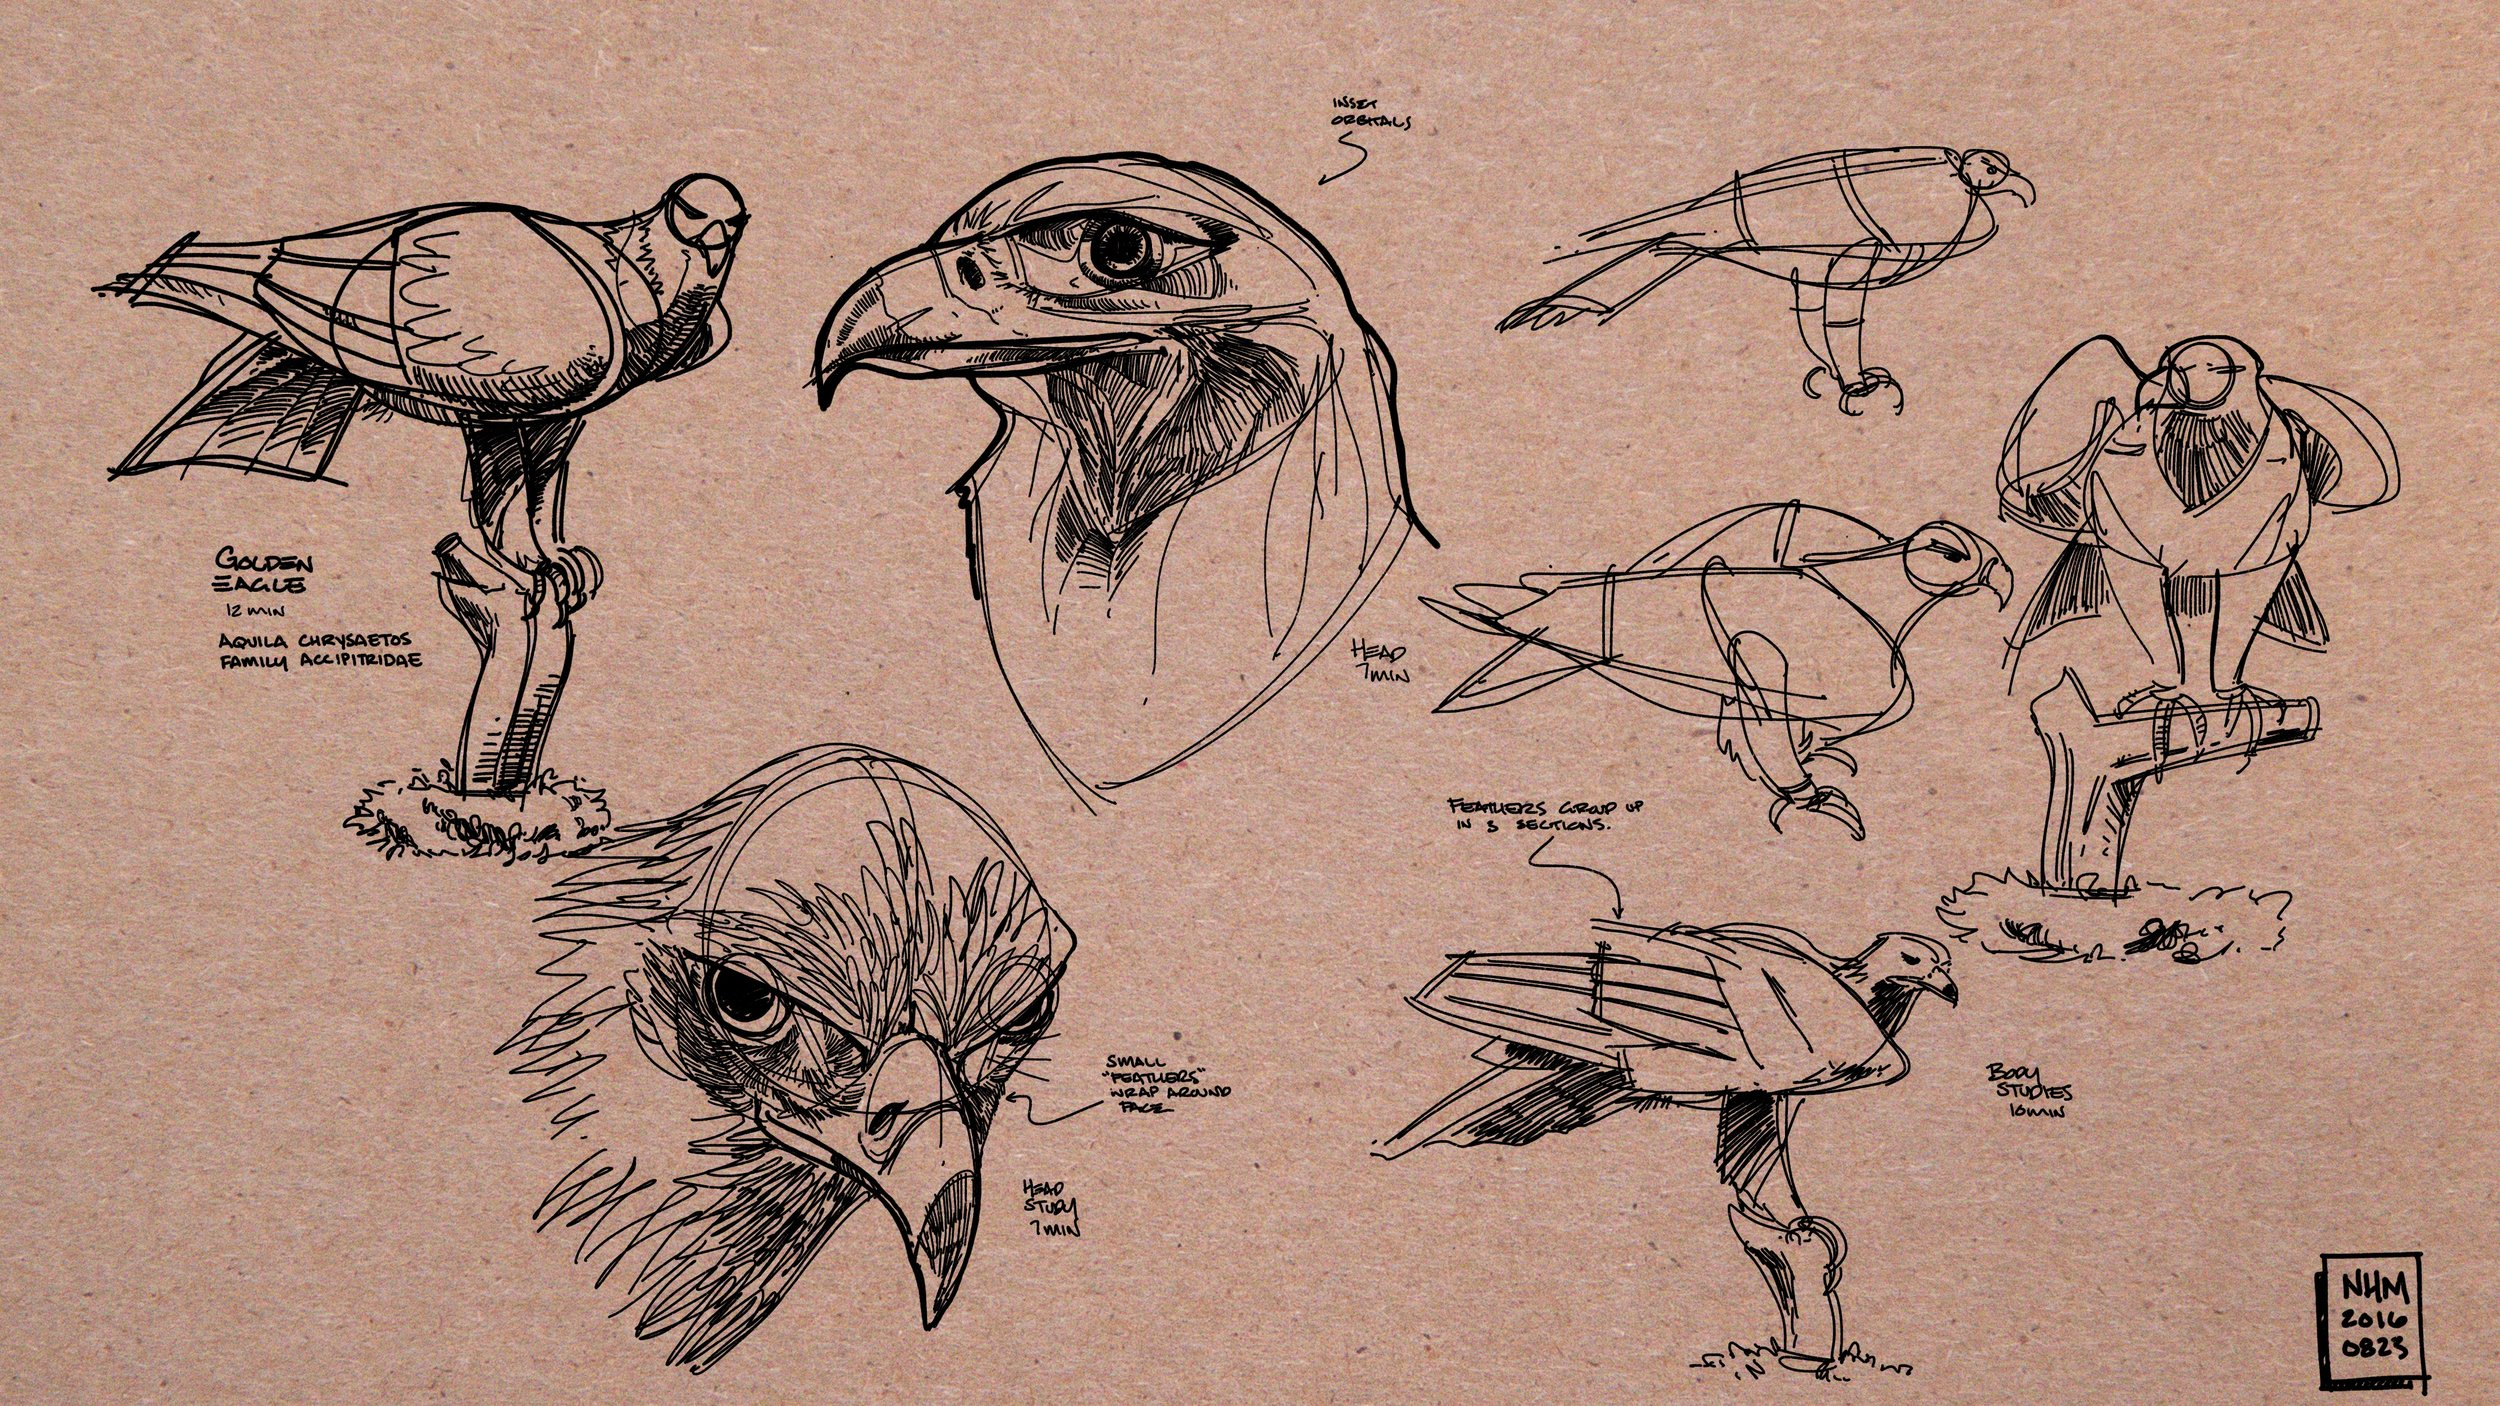 NHM_-_golden_eagle.jpg